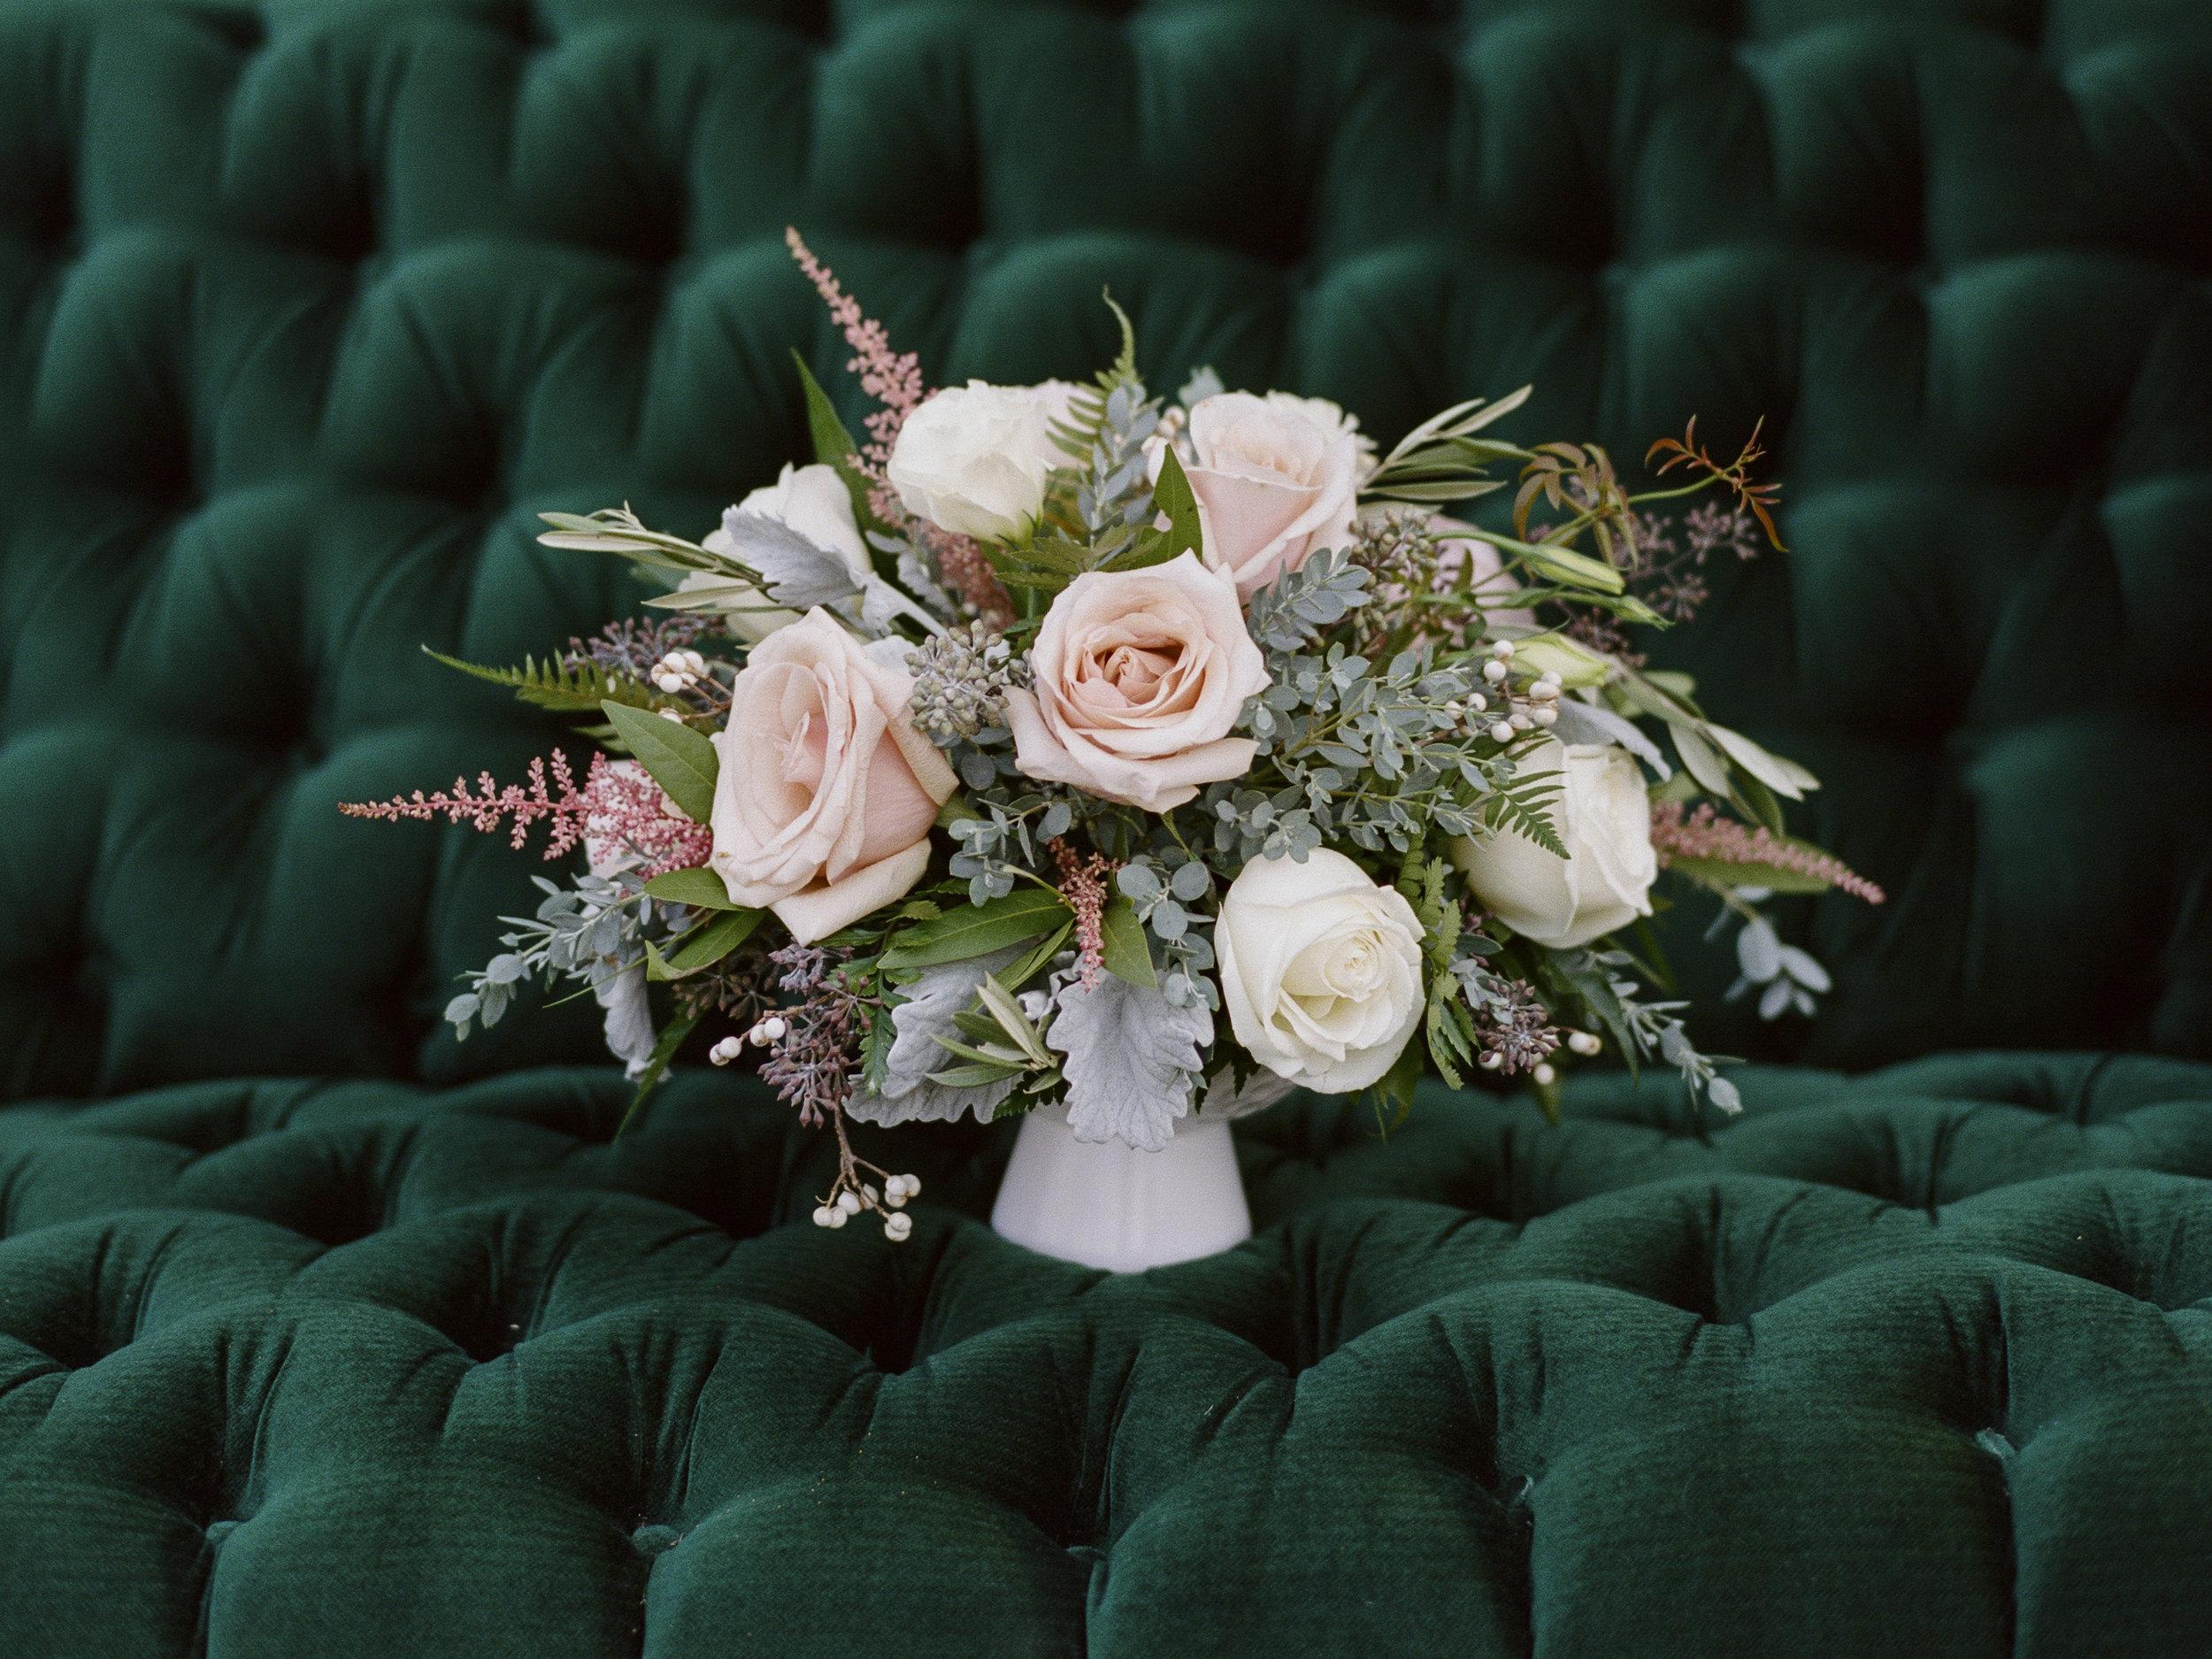 Violette-fleurs-roseville-sacramento-california-Flower-farm-inn-wedding-florist-spring-centerpiece-blush-peach.jpg